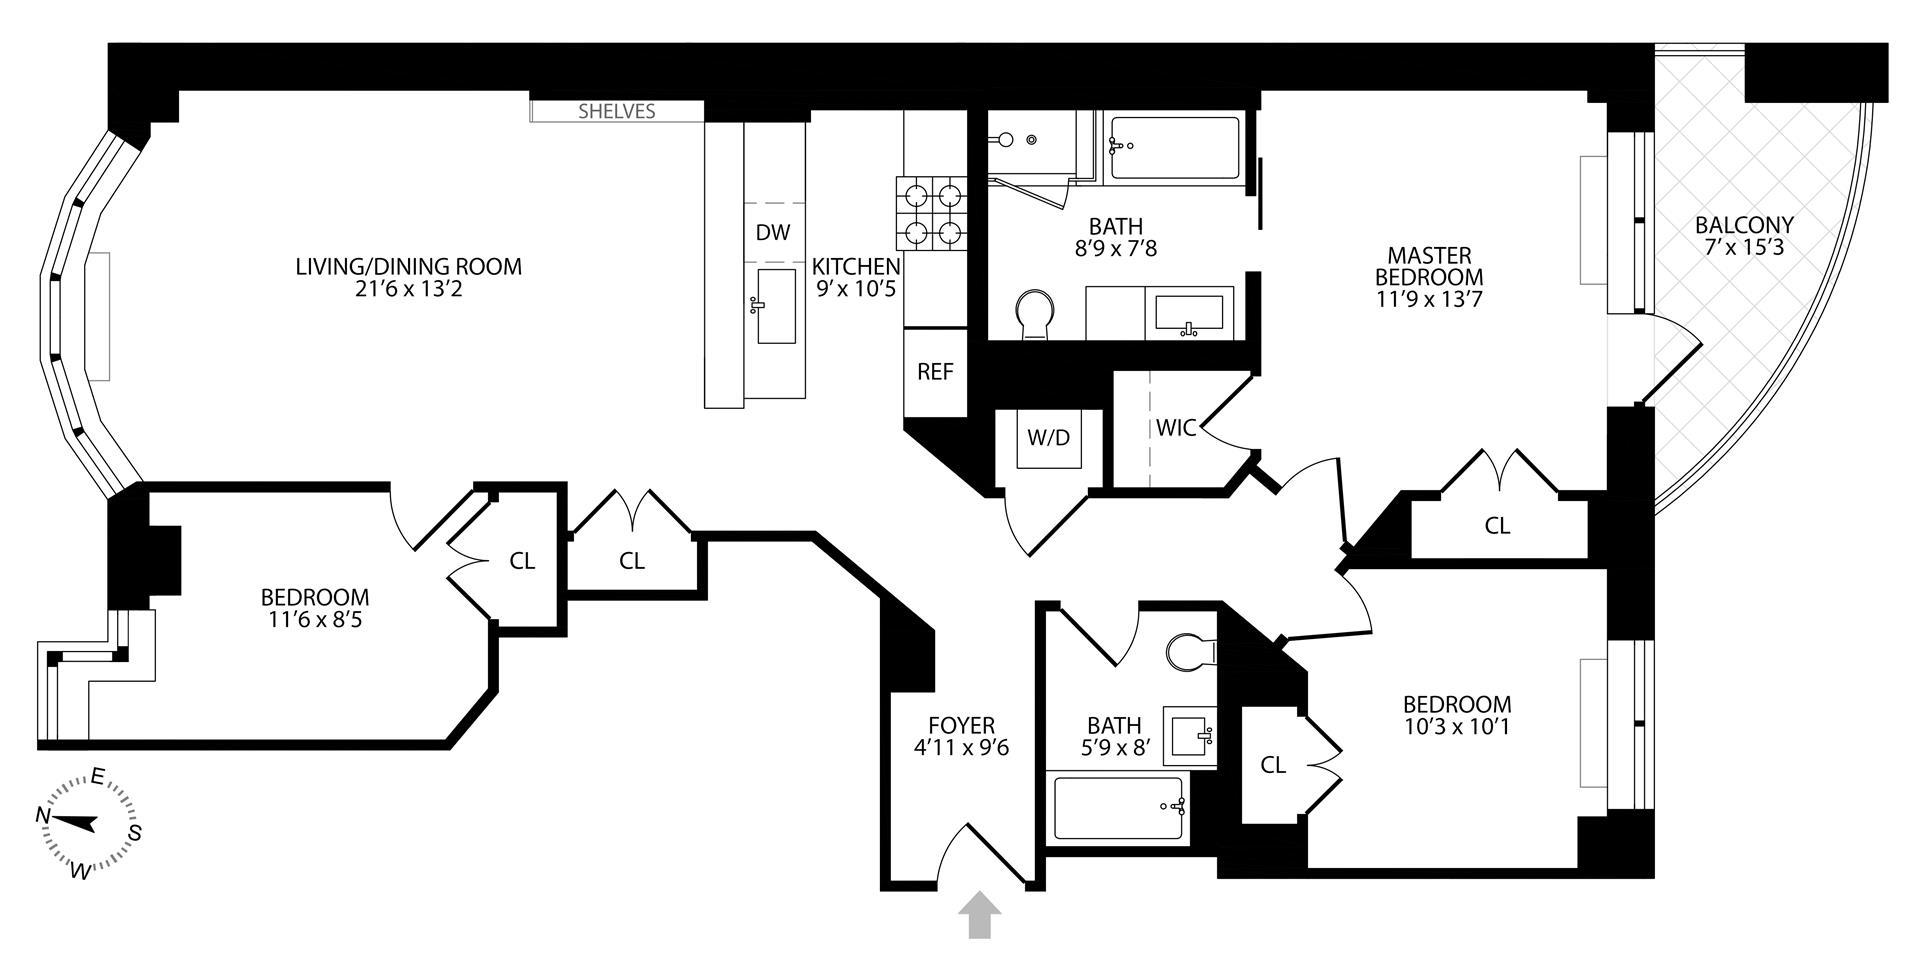 Floor plan of 20 Bayard St, 9D - Williamsburg, New York